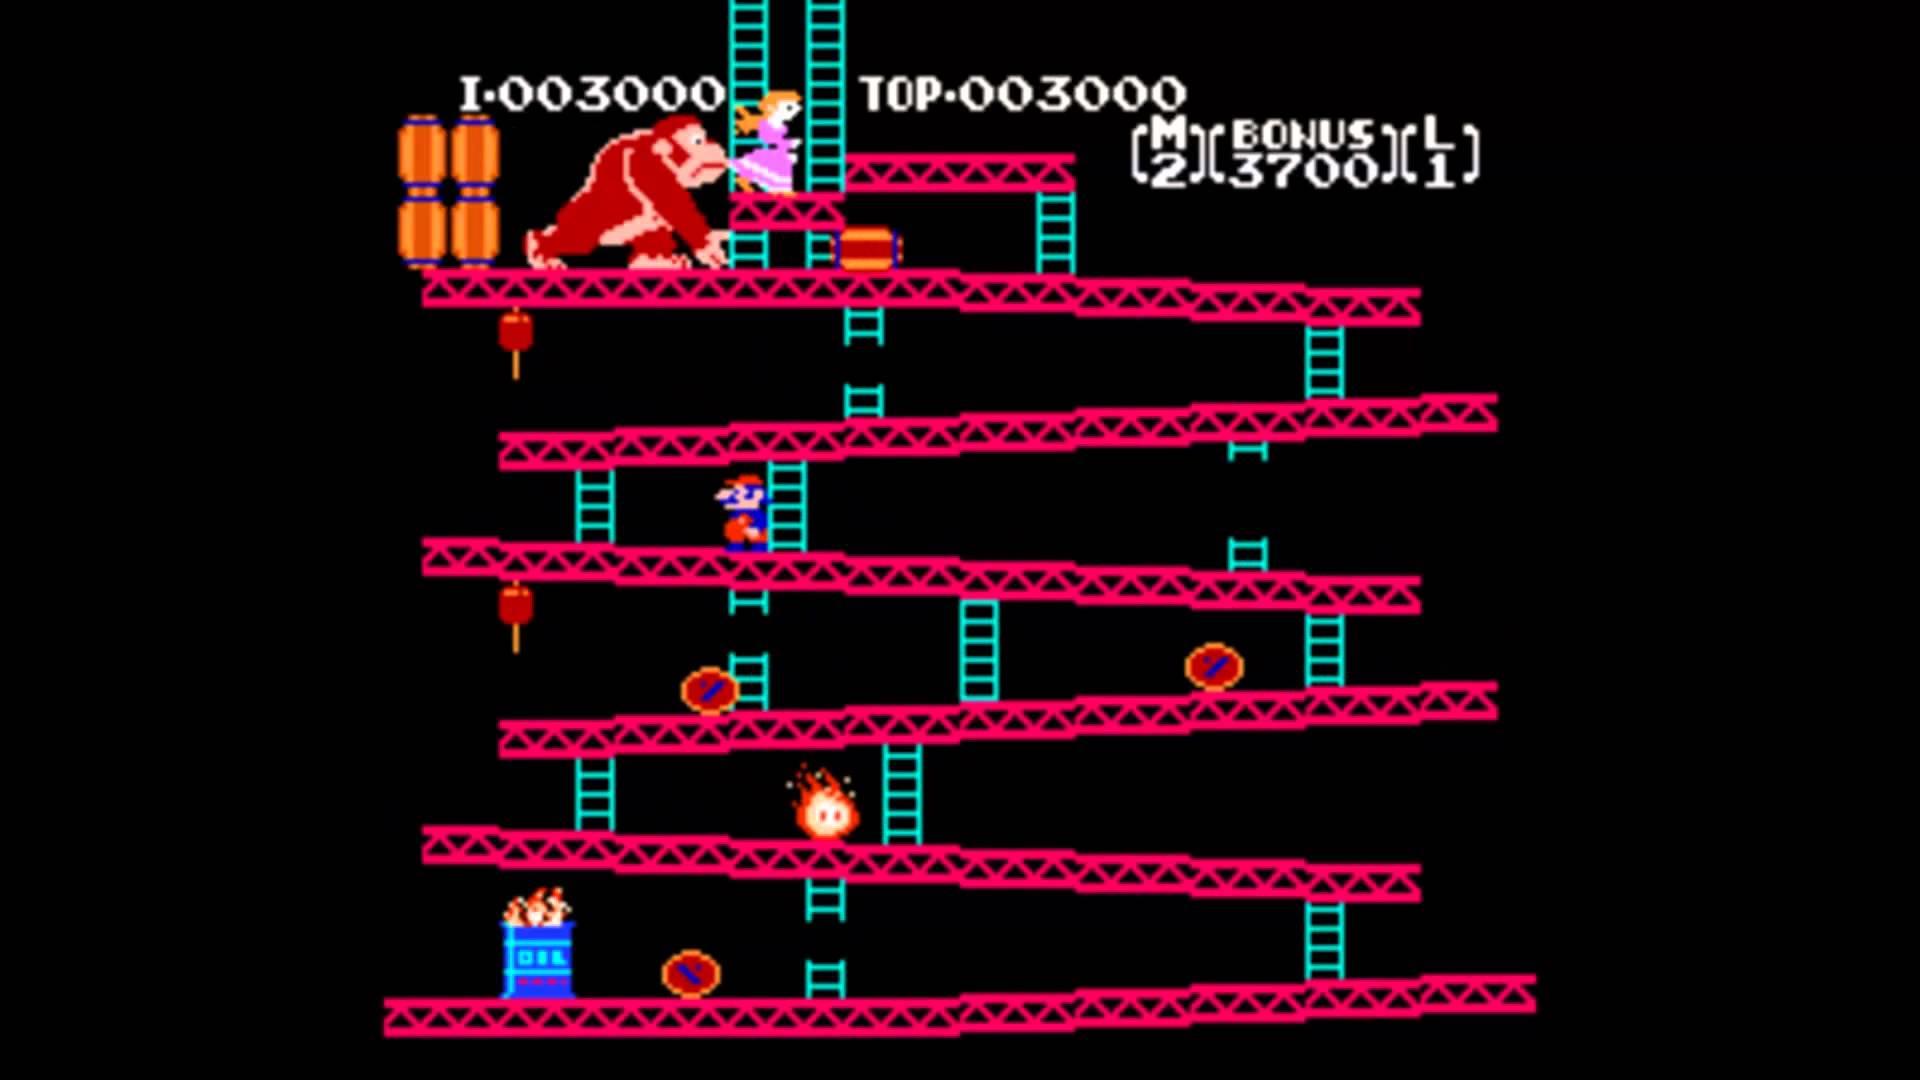 Donkey Kong Arcade Wallpaper Games zoals donkey kong 1920x1080